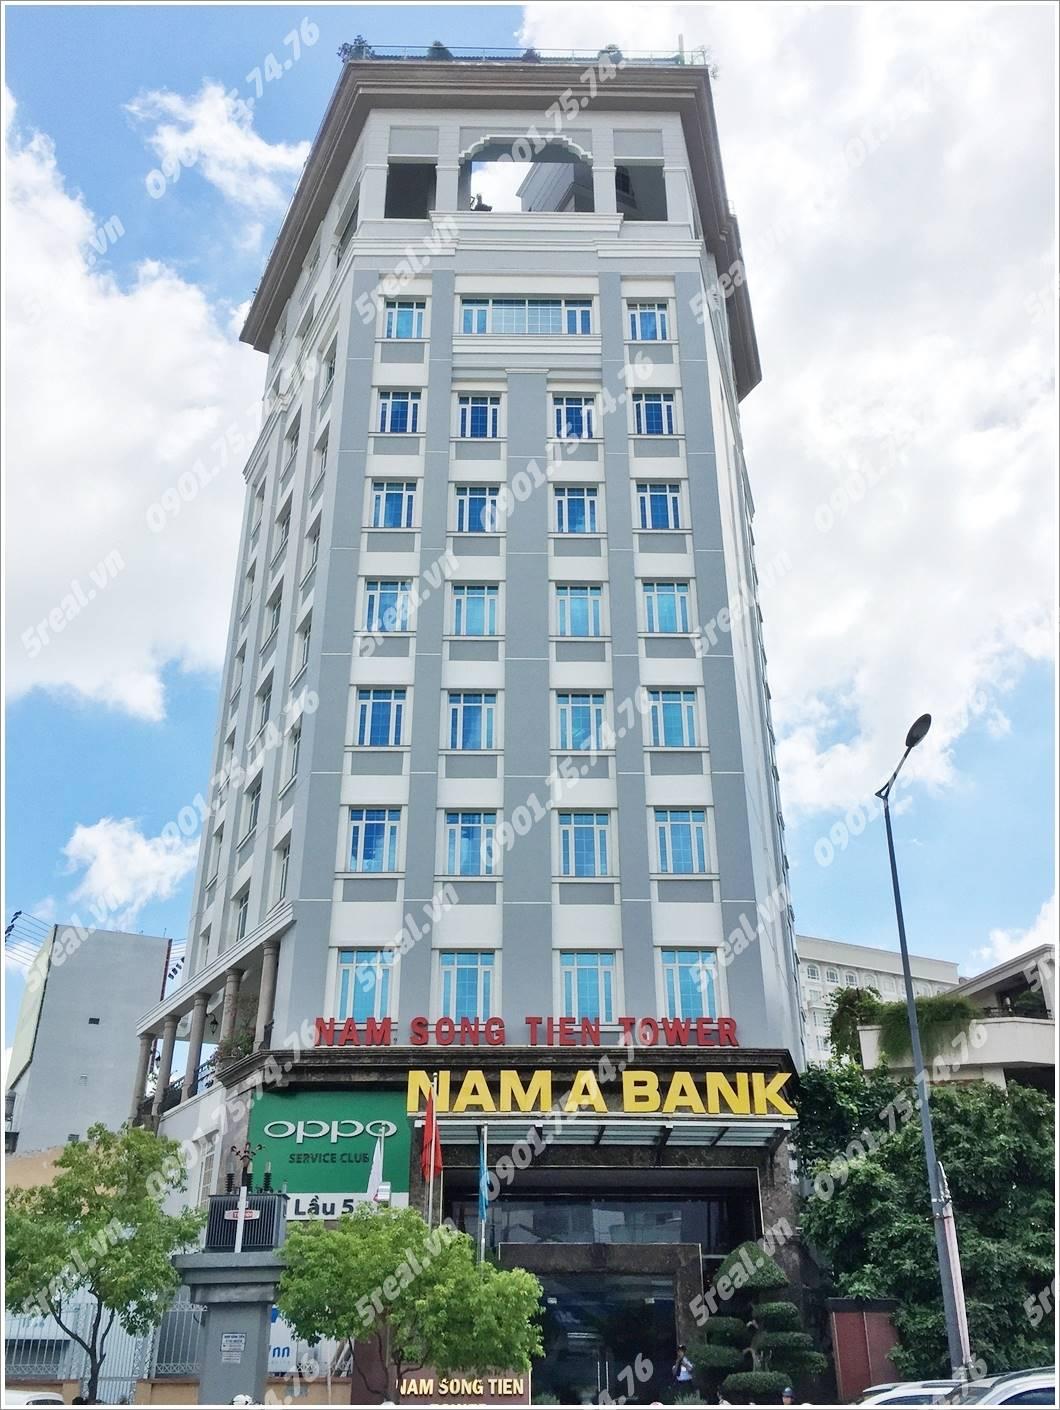 nam-song-tien-tower-nguyen-van-troi-quan-phu-nhuan-van-phong-cho-thue-tphcm-5real.vn-01